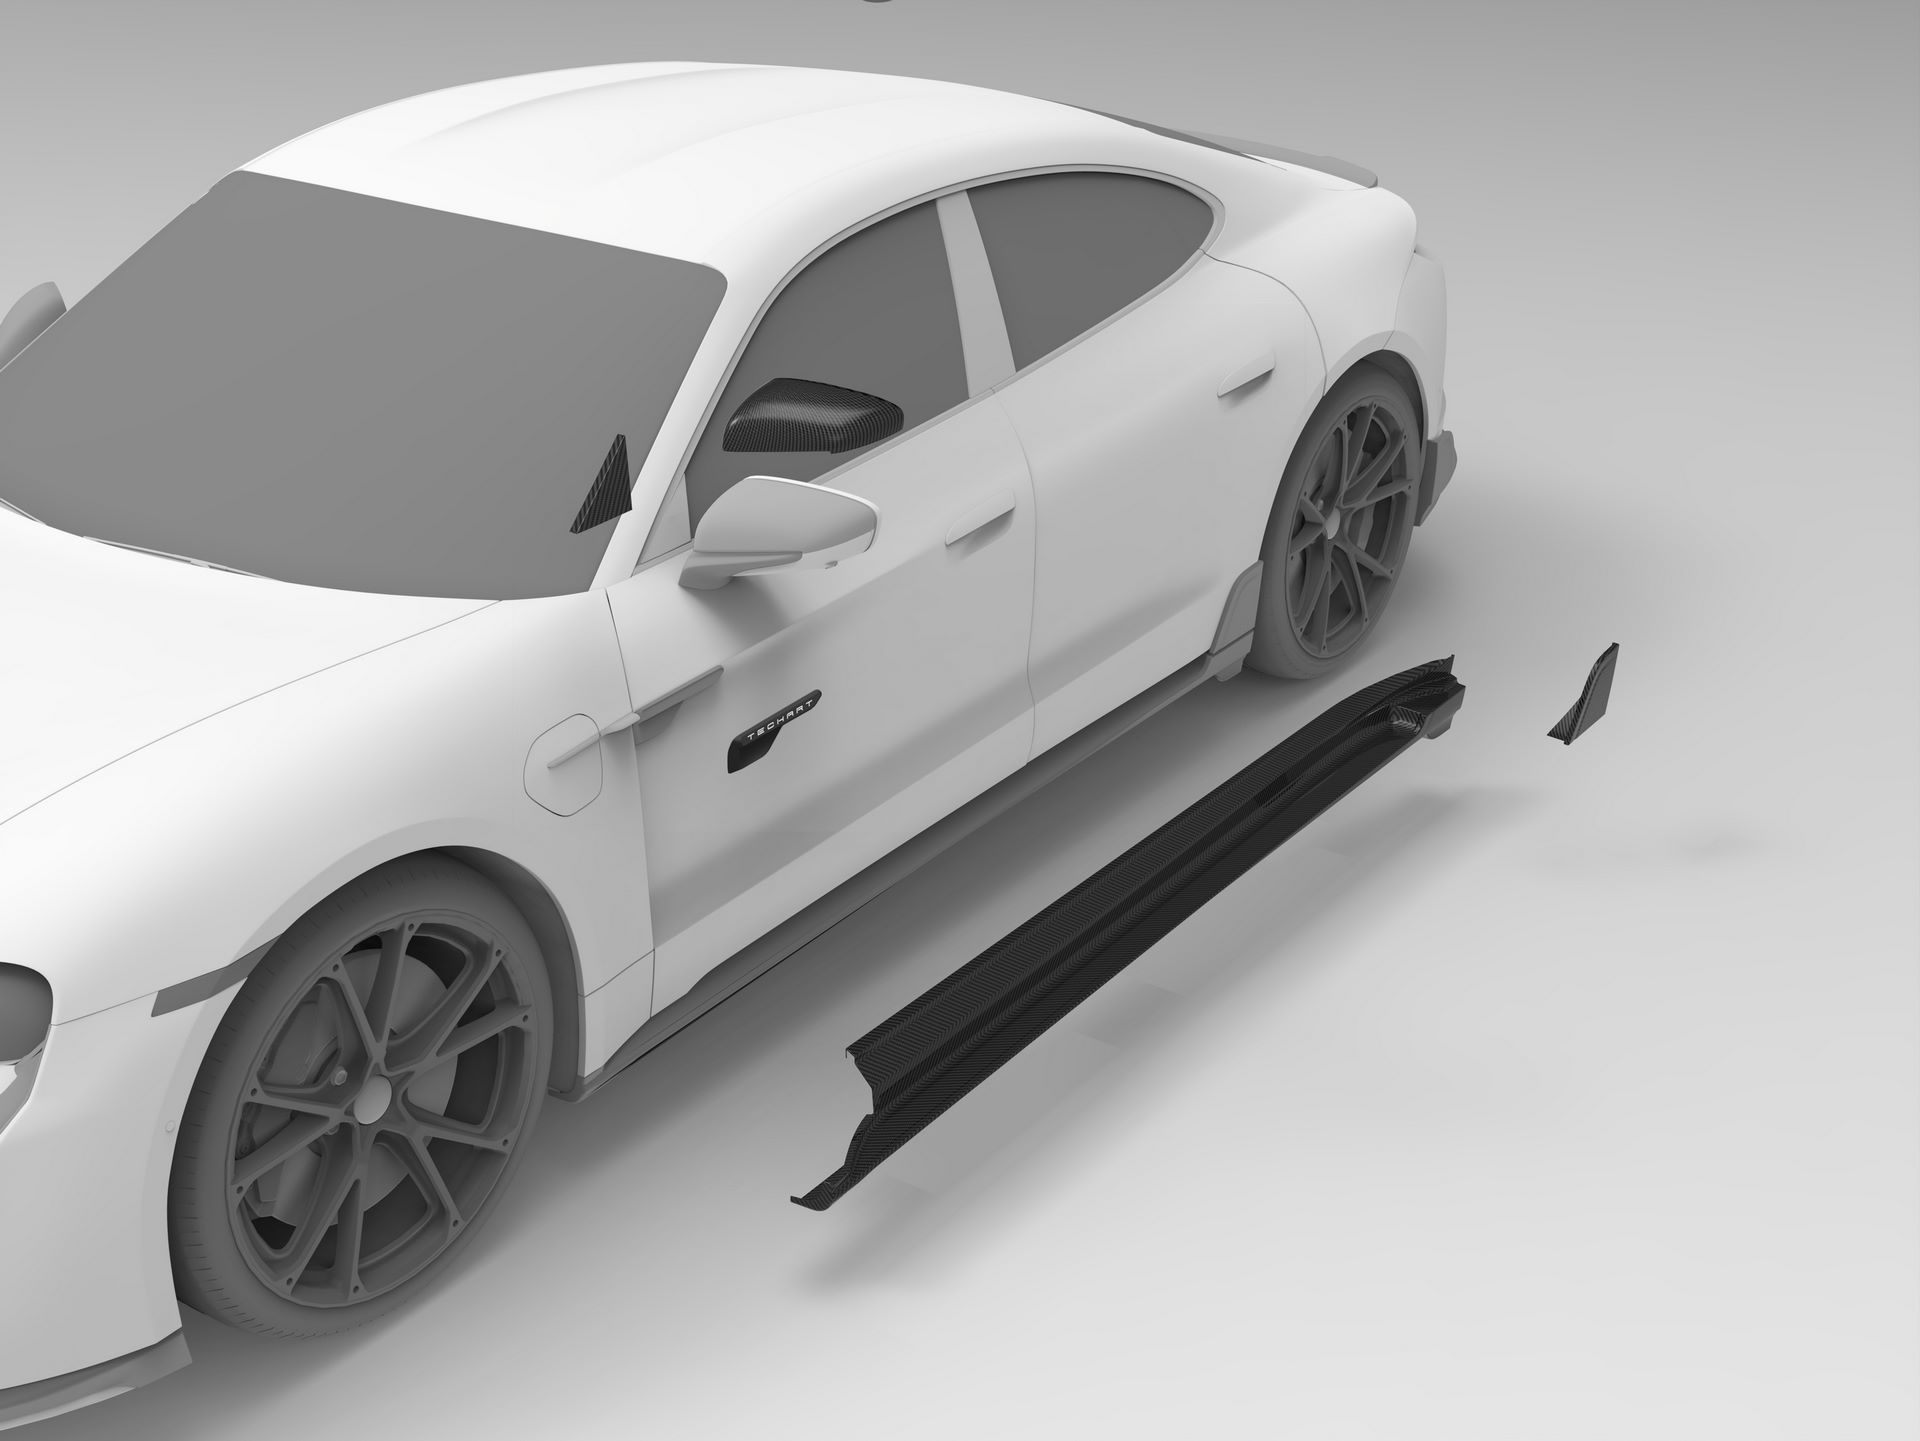 Porsche-Taycan-bodykit-by-TechArt-29